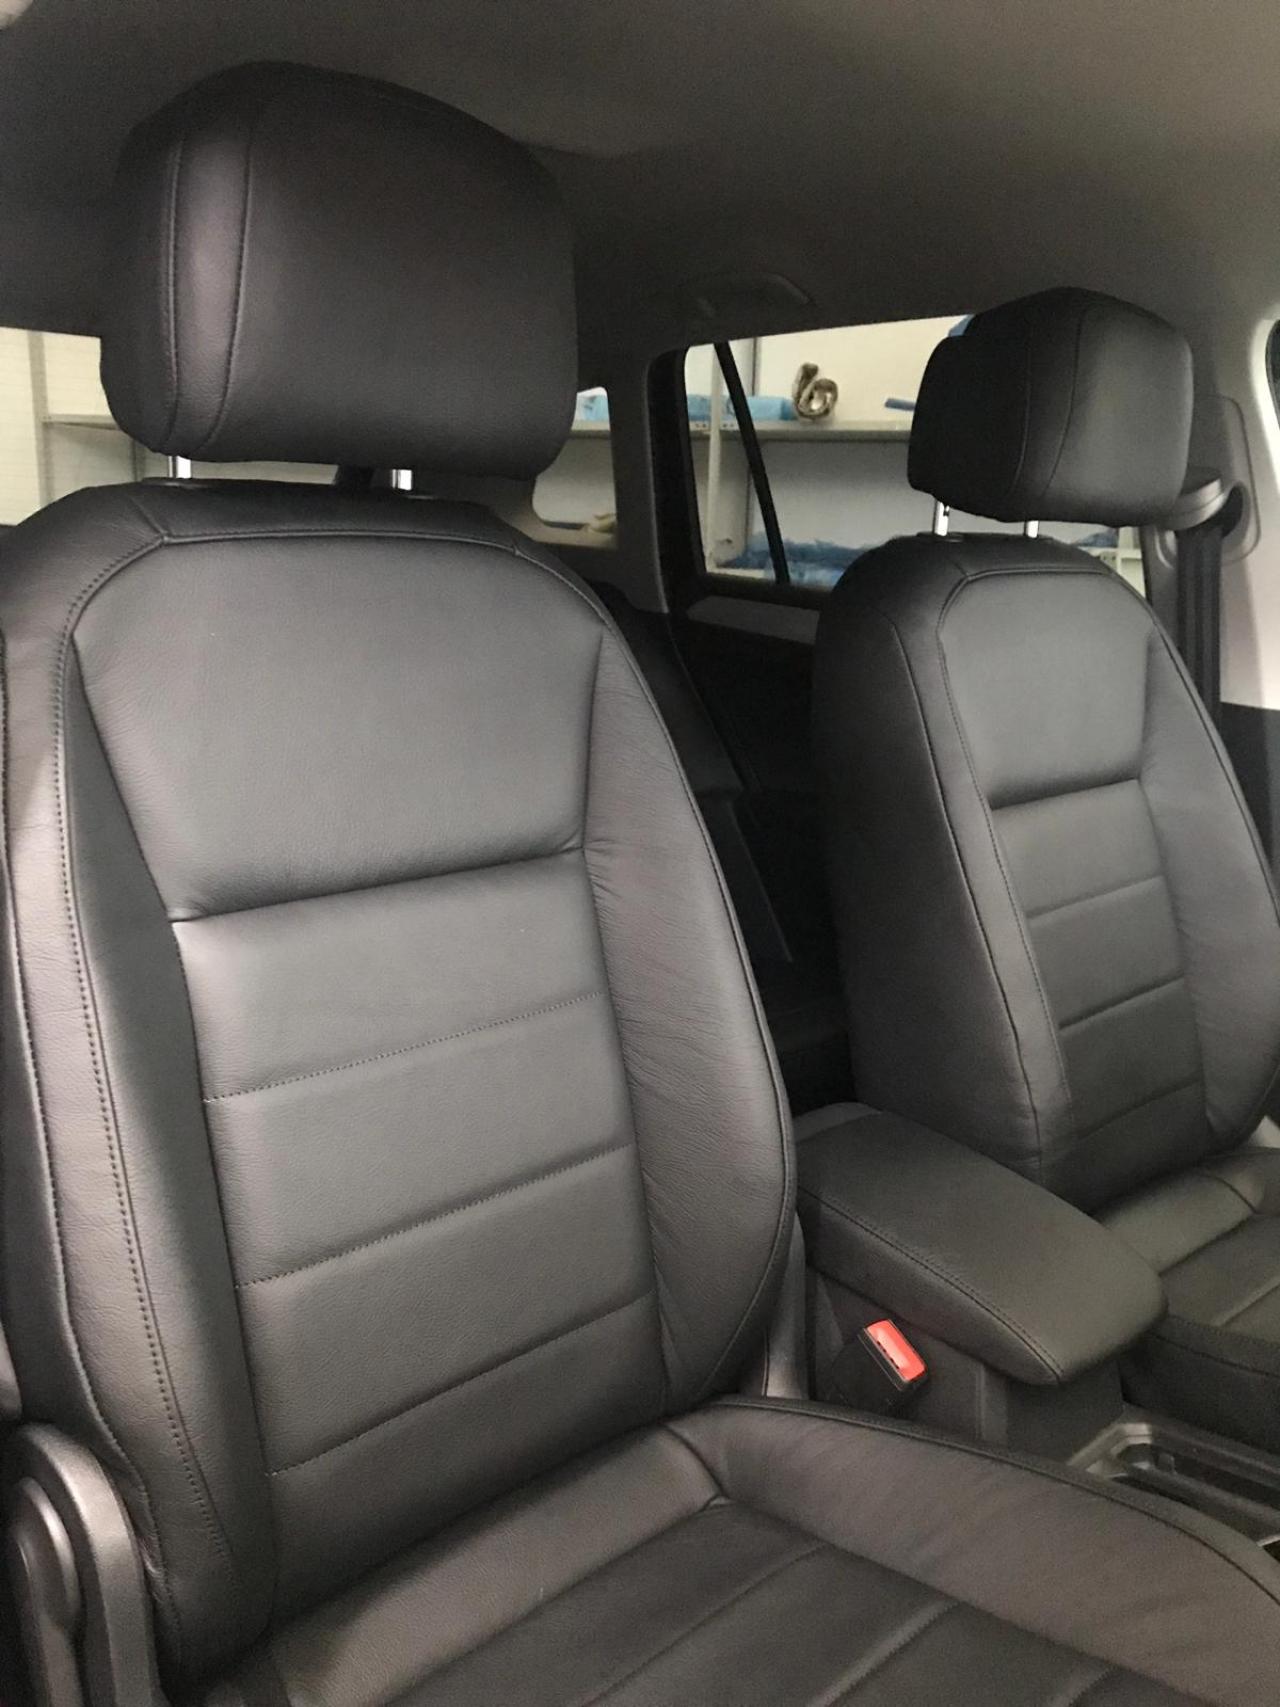 Nuovi interni in pelle Volkswagen Tiguan R Line 2018